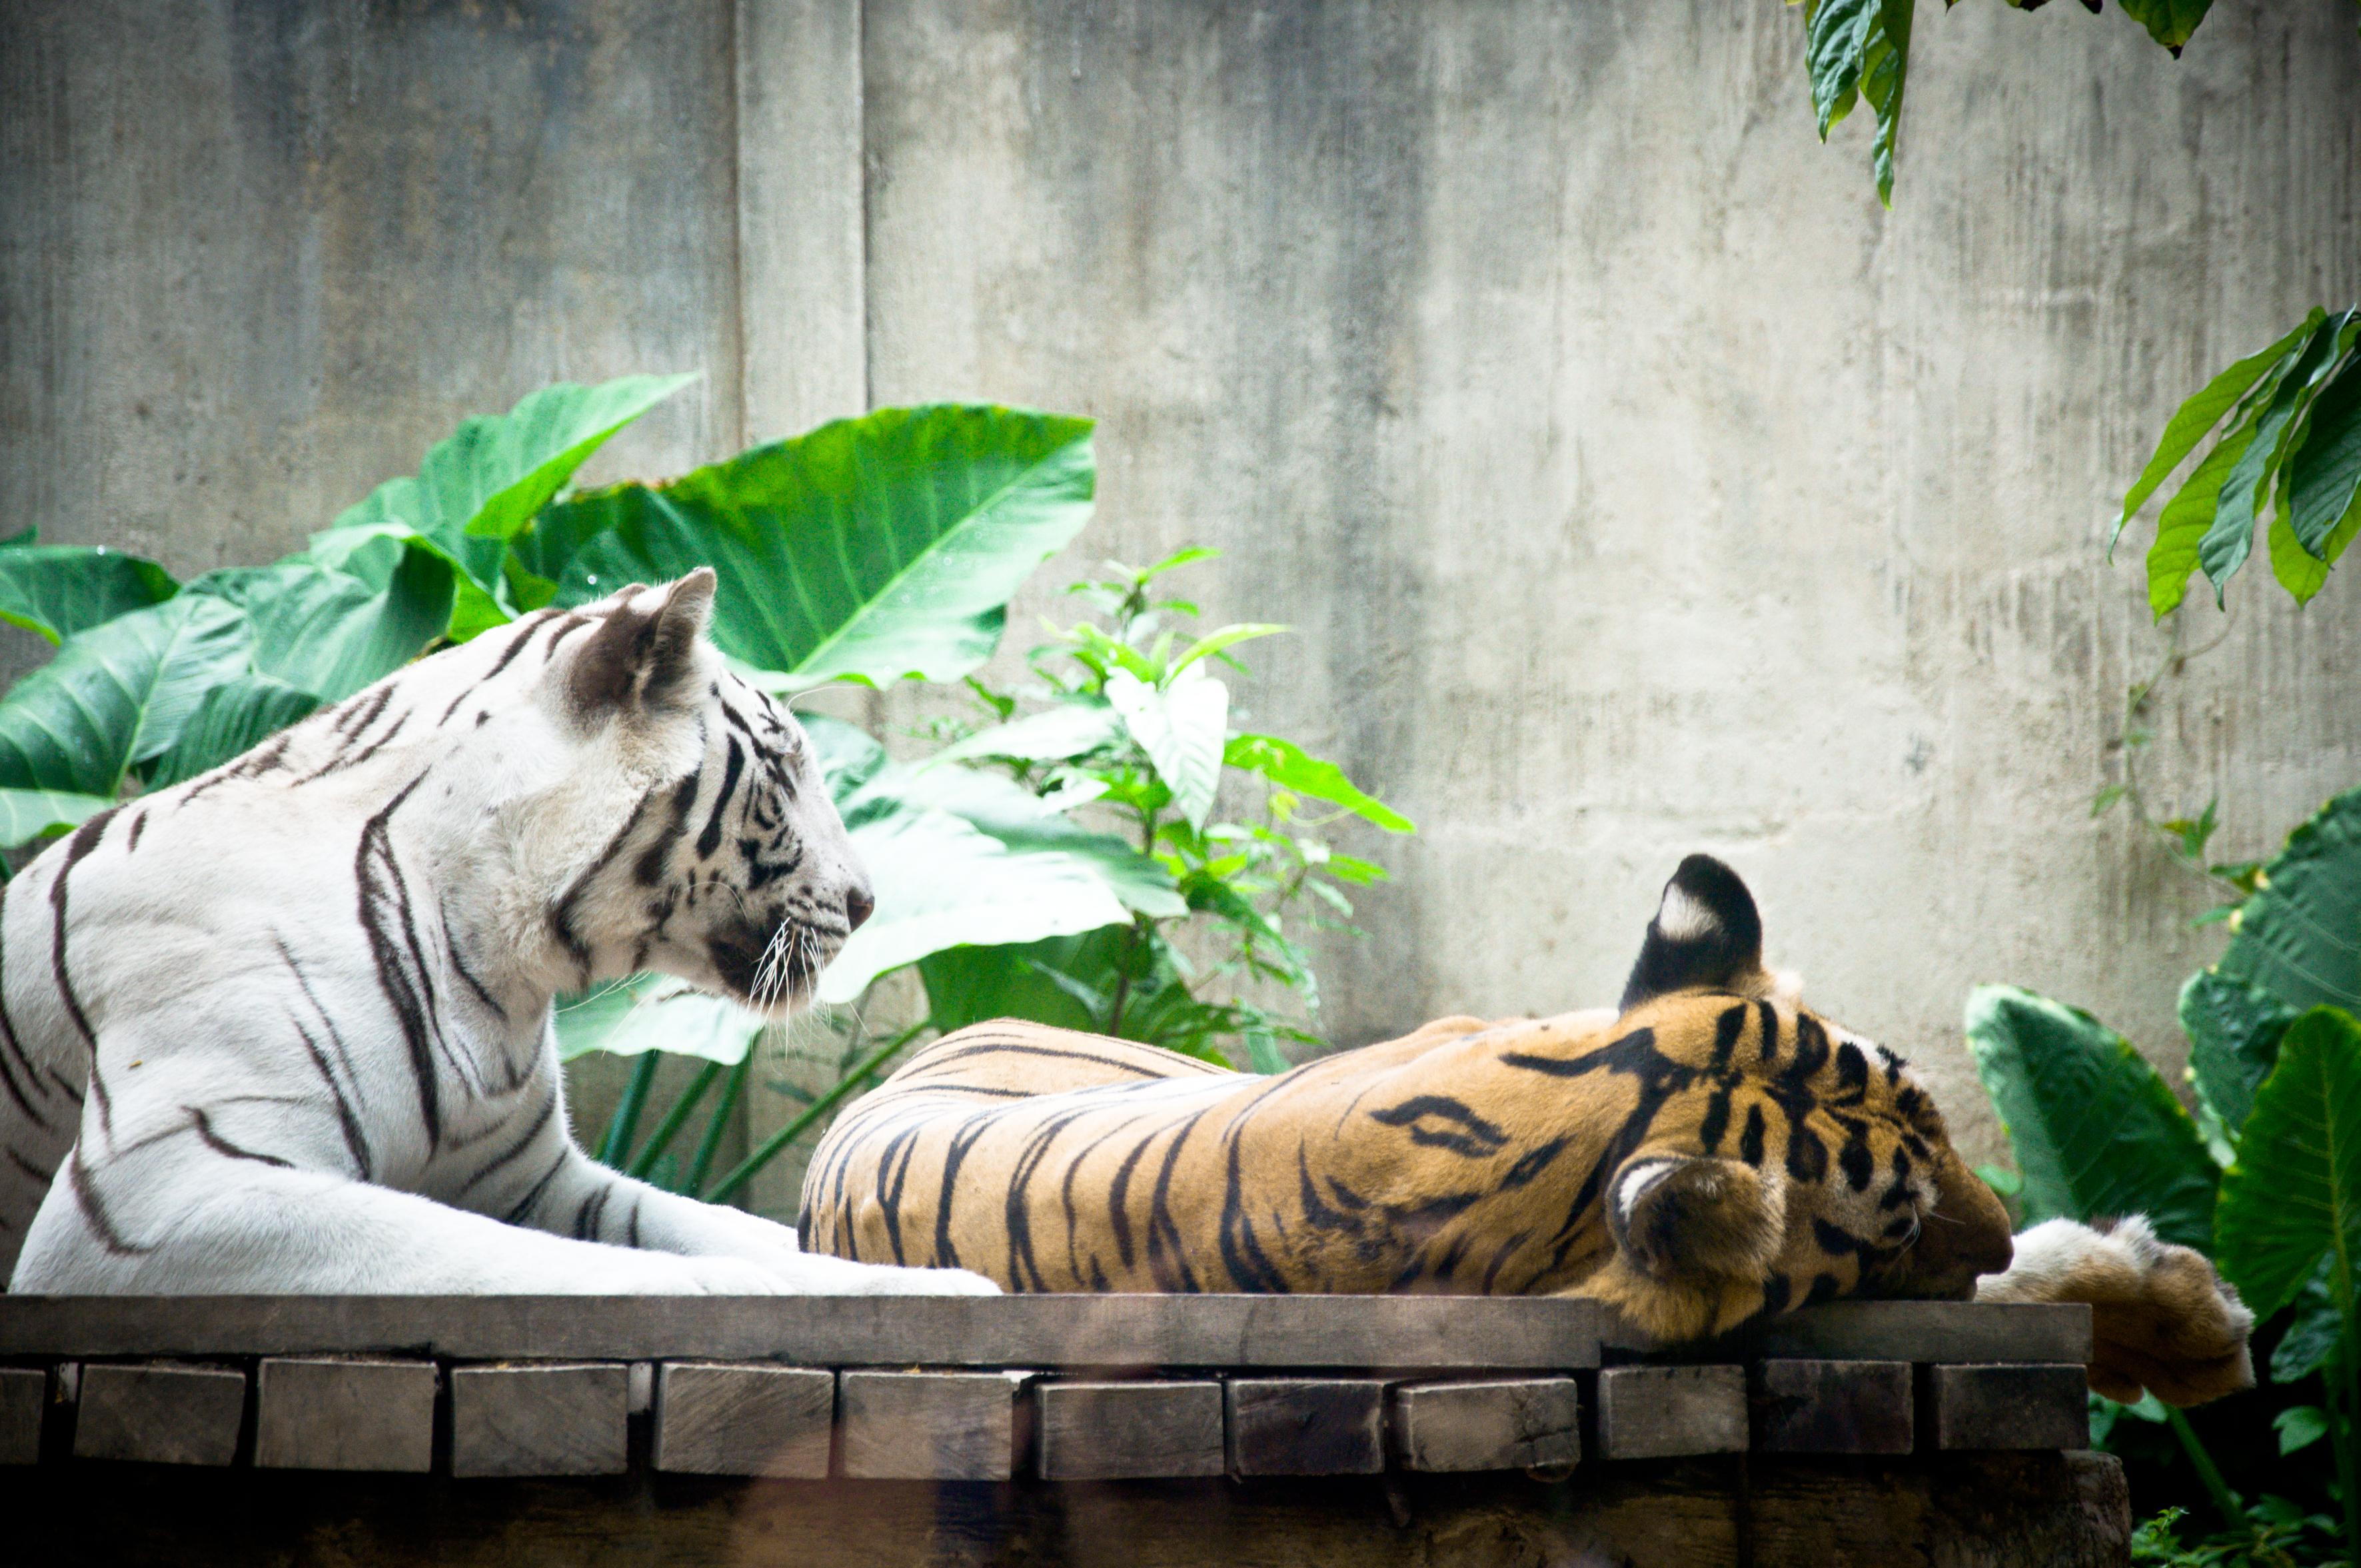 Tigers, Animal, Cat, Feline, Hunter, HQ Photo